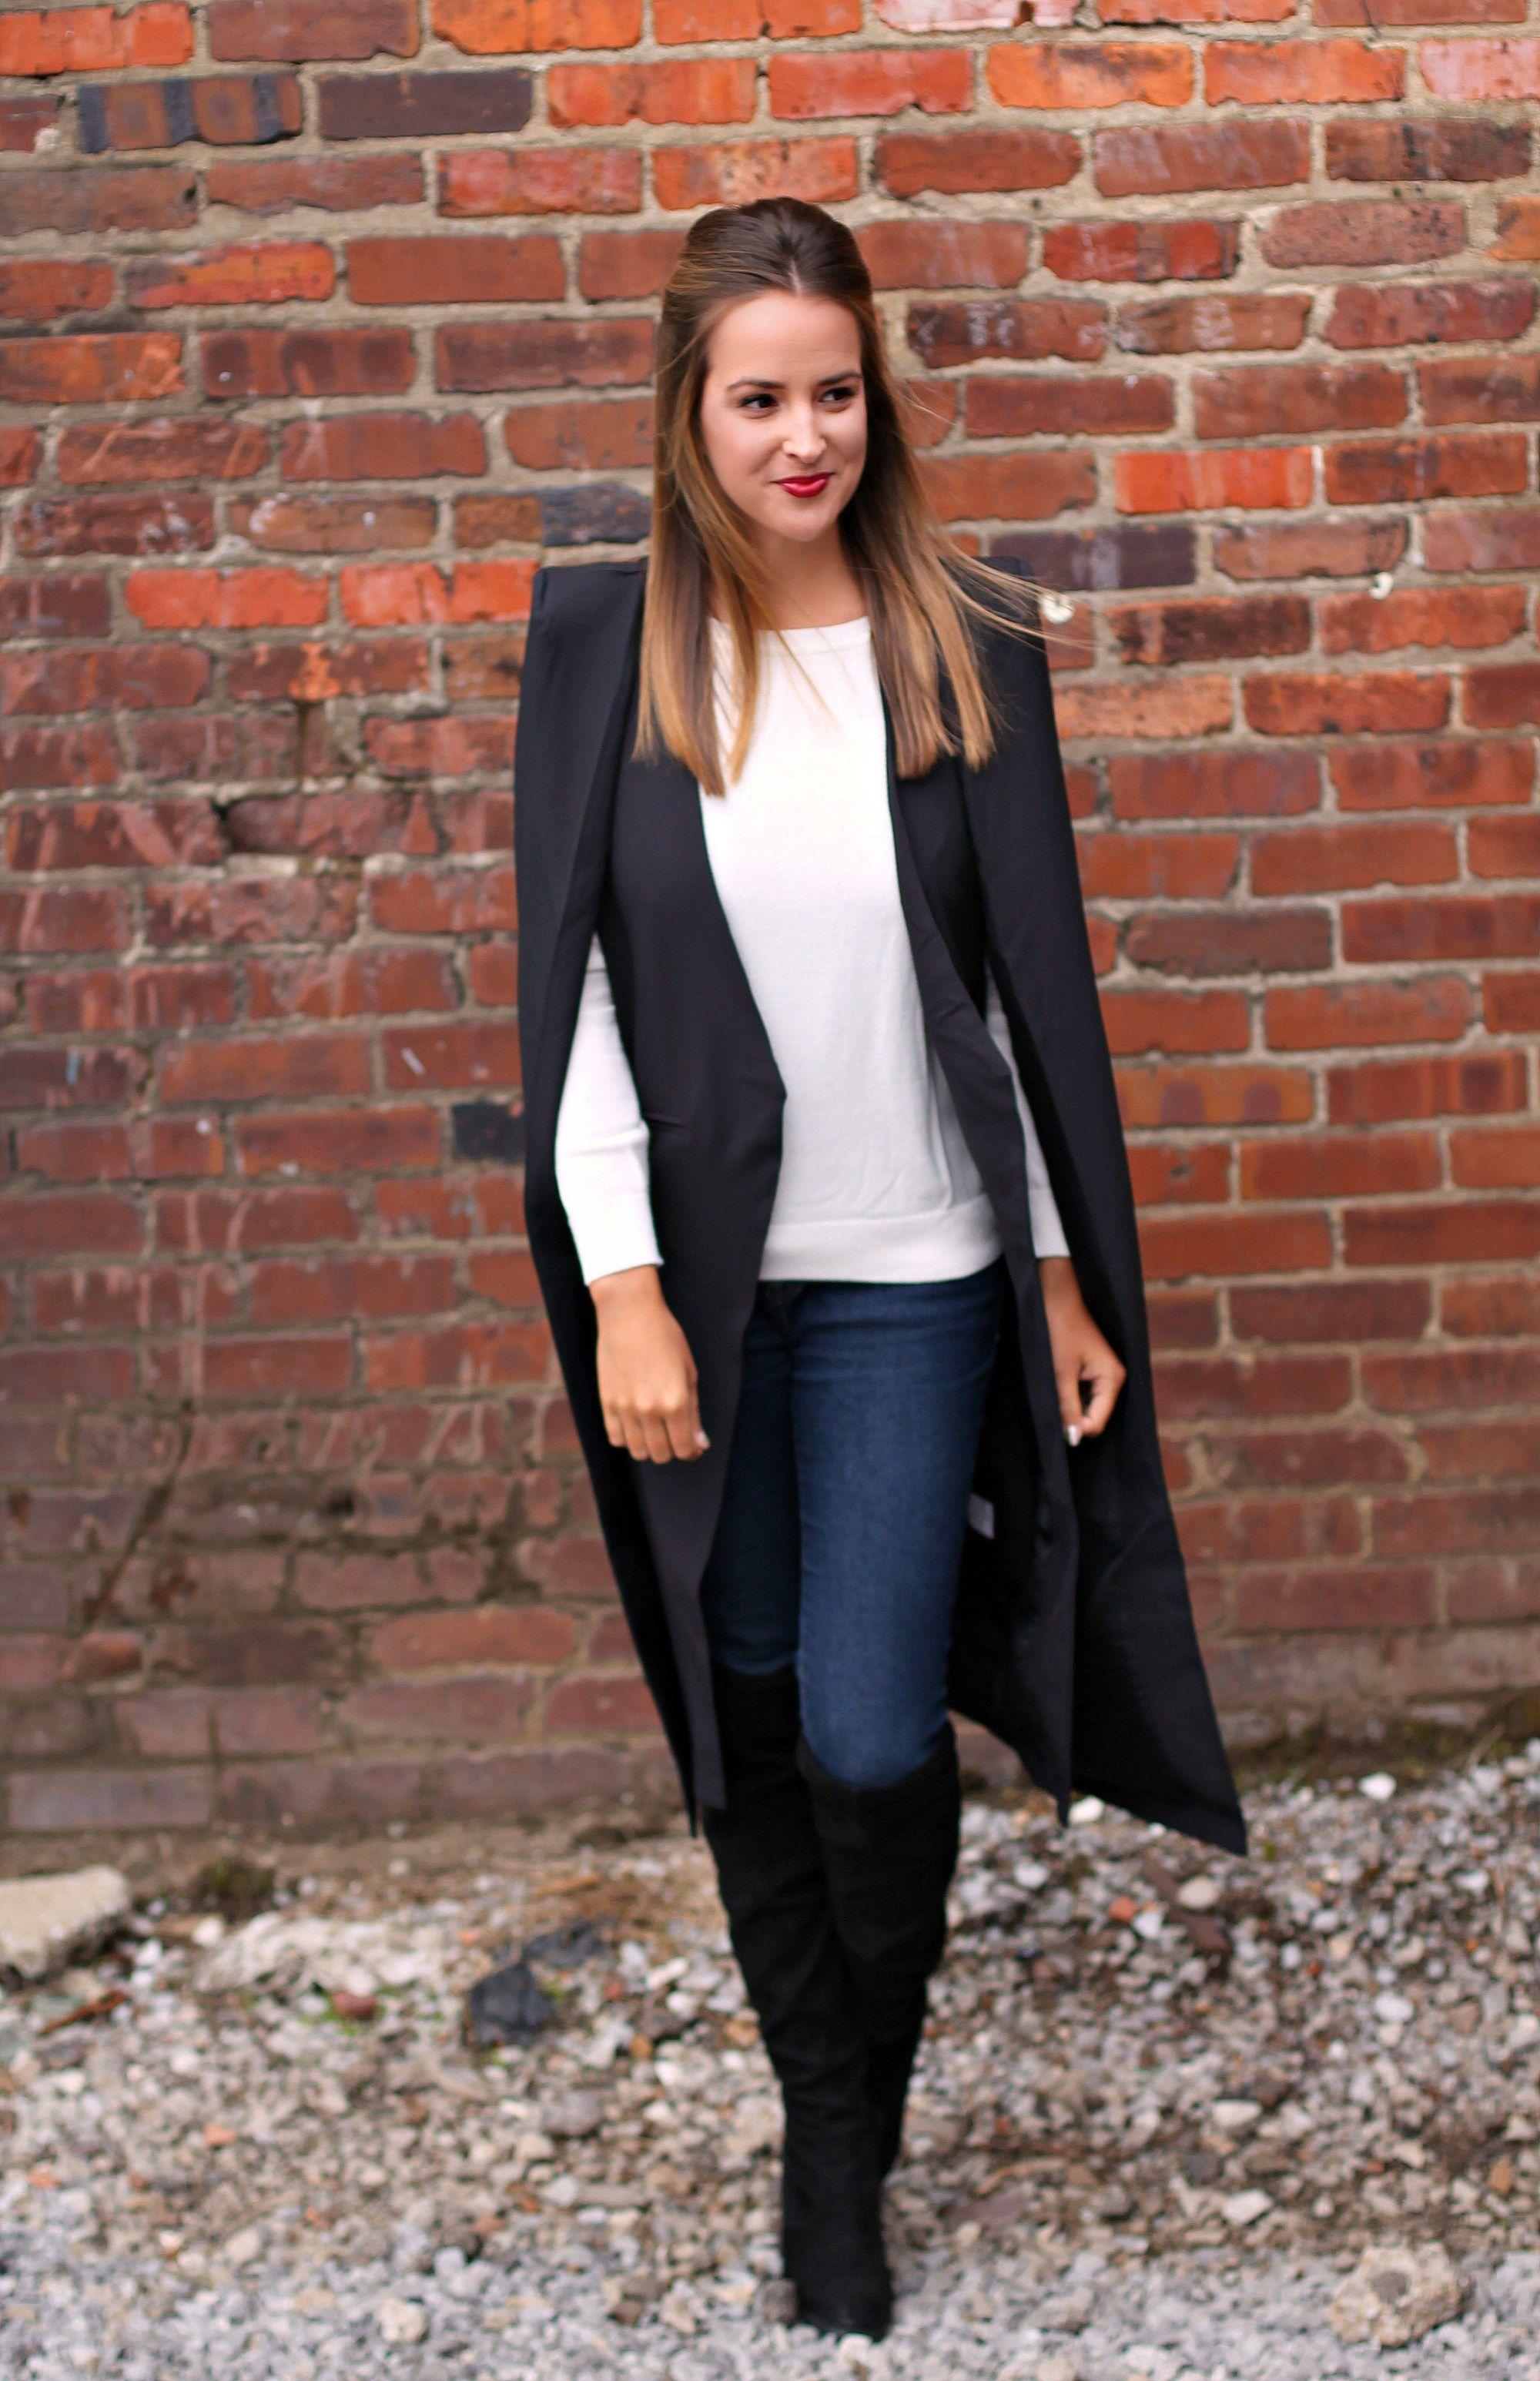 Black Longline Cape #lexwhatwear #nashvillestyle #nashvillefashion #nashvilleblogger #styleblog #fashionblog #outfitideas #outfitinspiration #winterstyle #winteroutfit #winterfashion #styleinspiration #styleideas